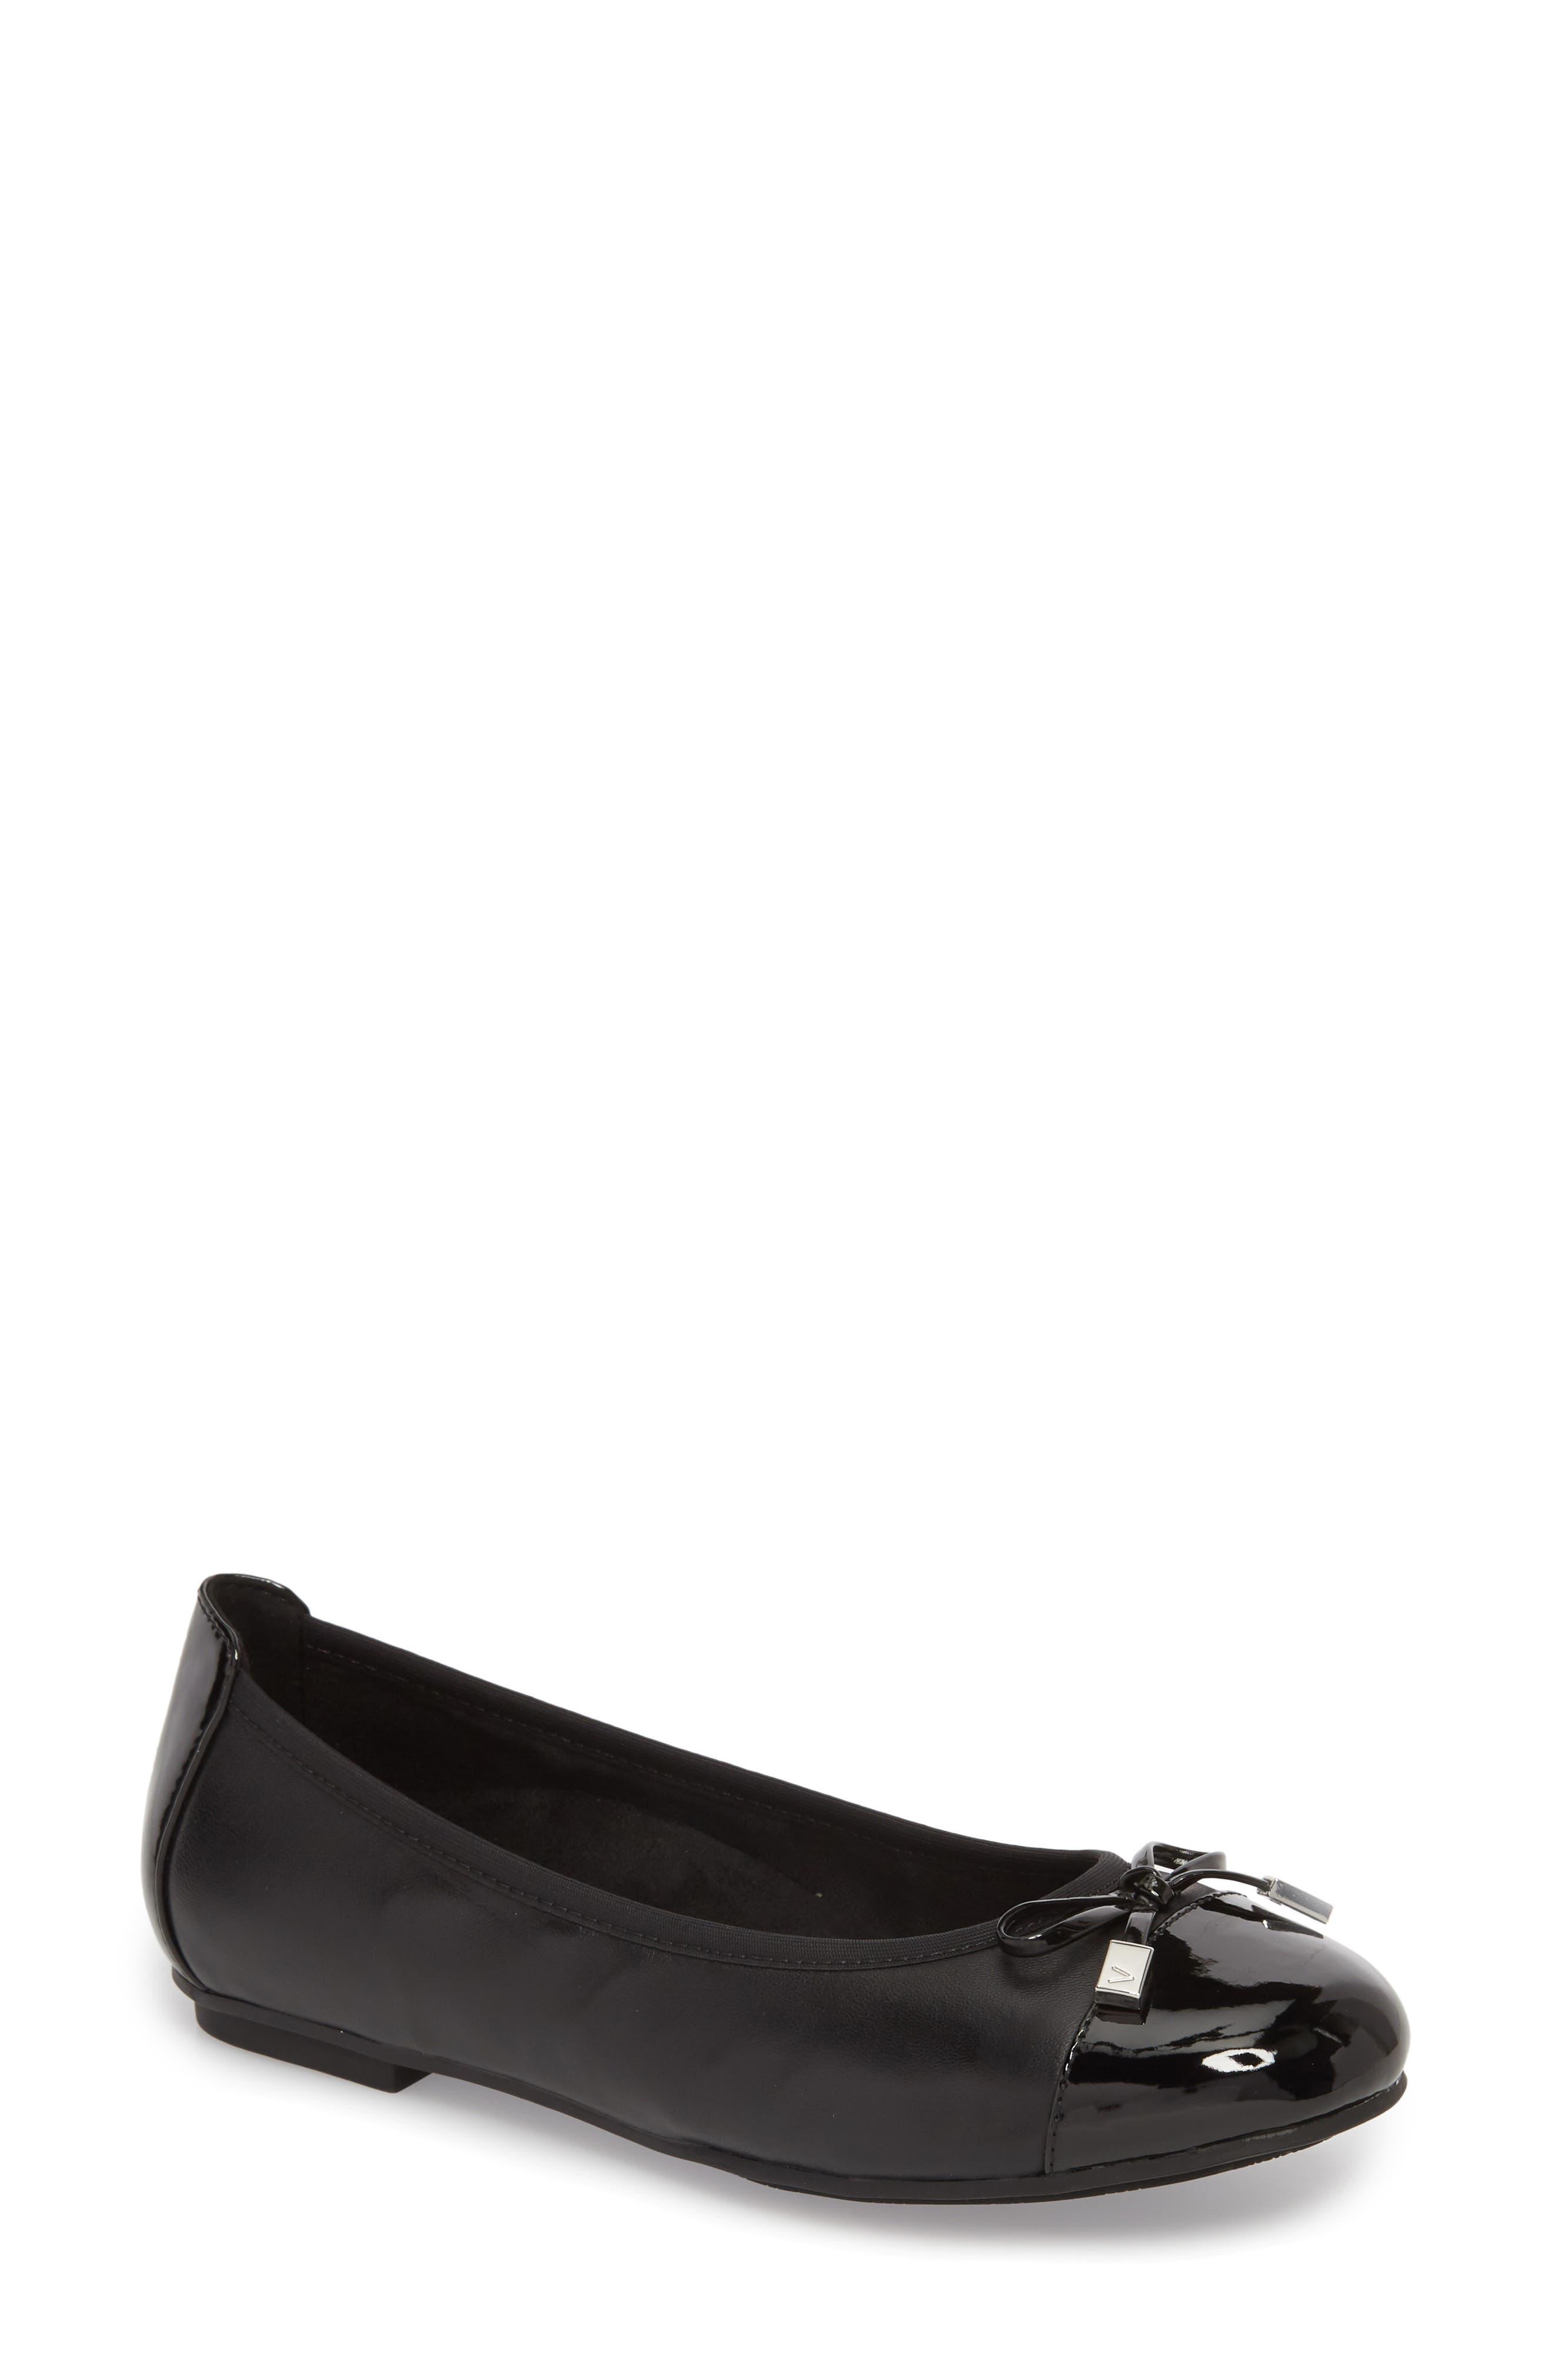 VIONIC 'Minna' Leather Flat, Main, color, 002